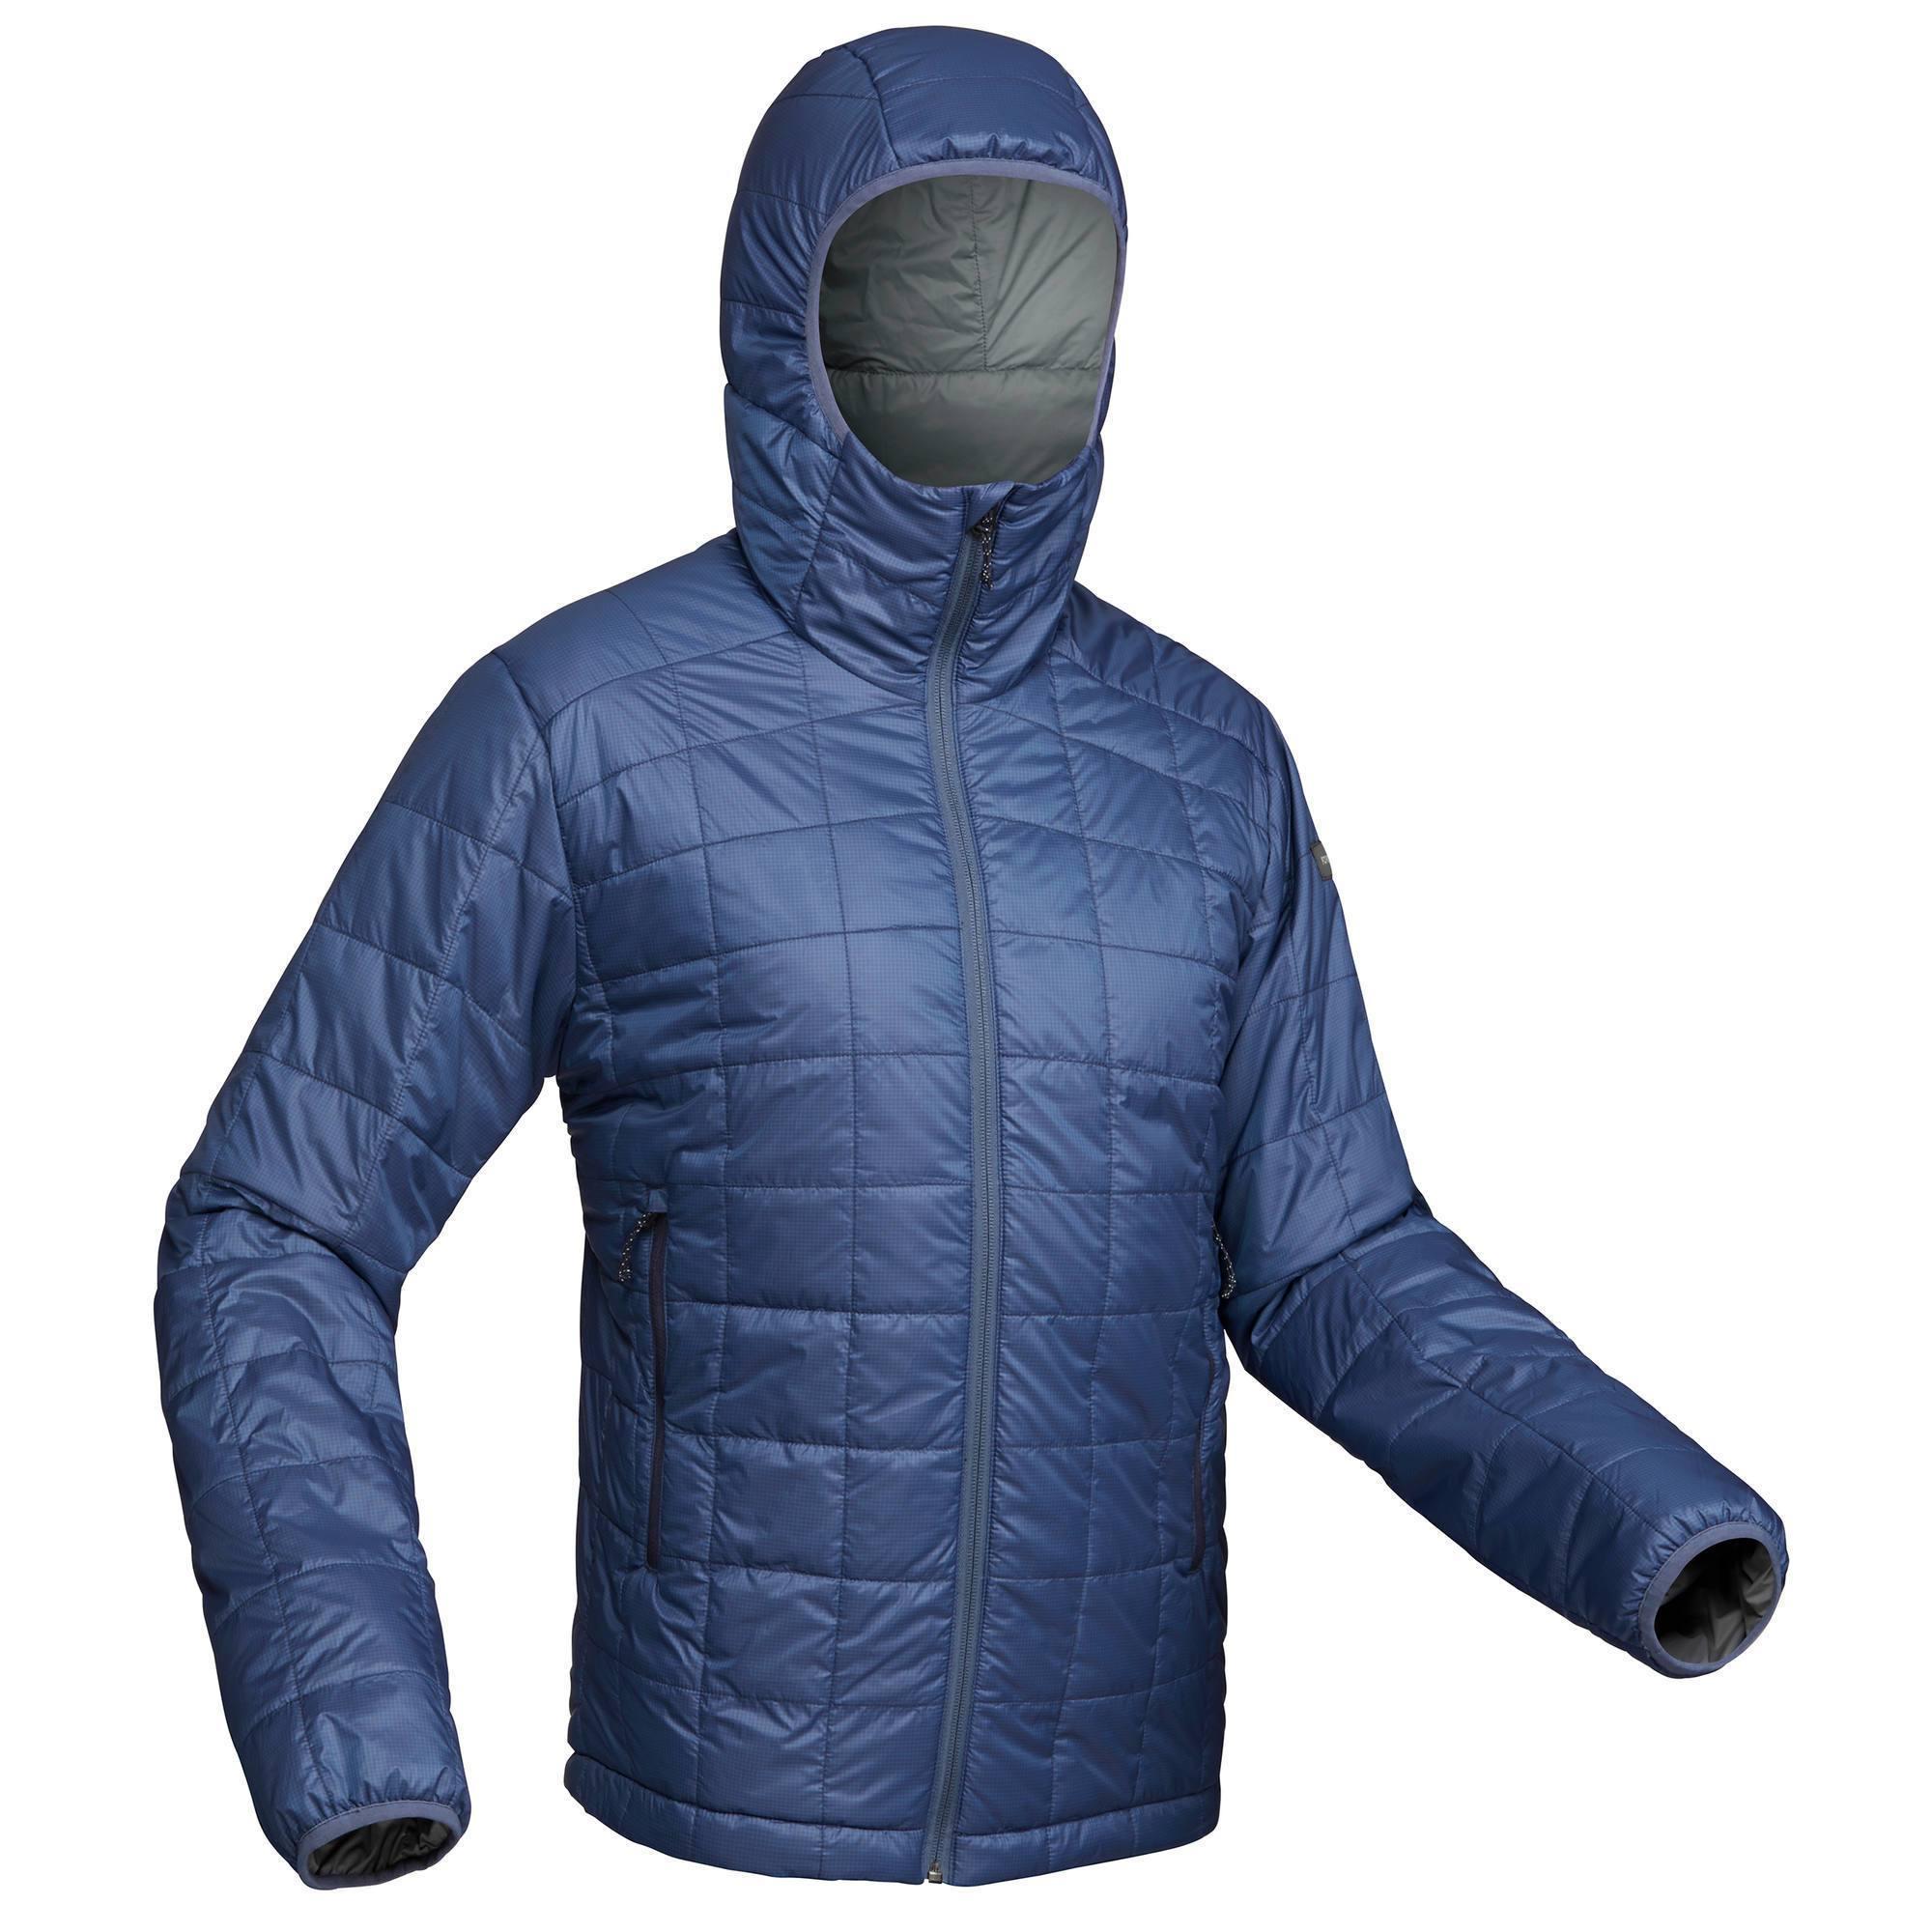 Doudoune trekking montagne TREK100 CAPUCHE homme bleu